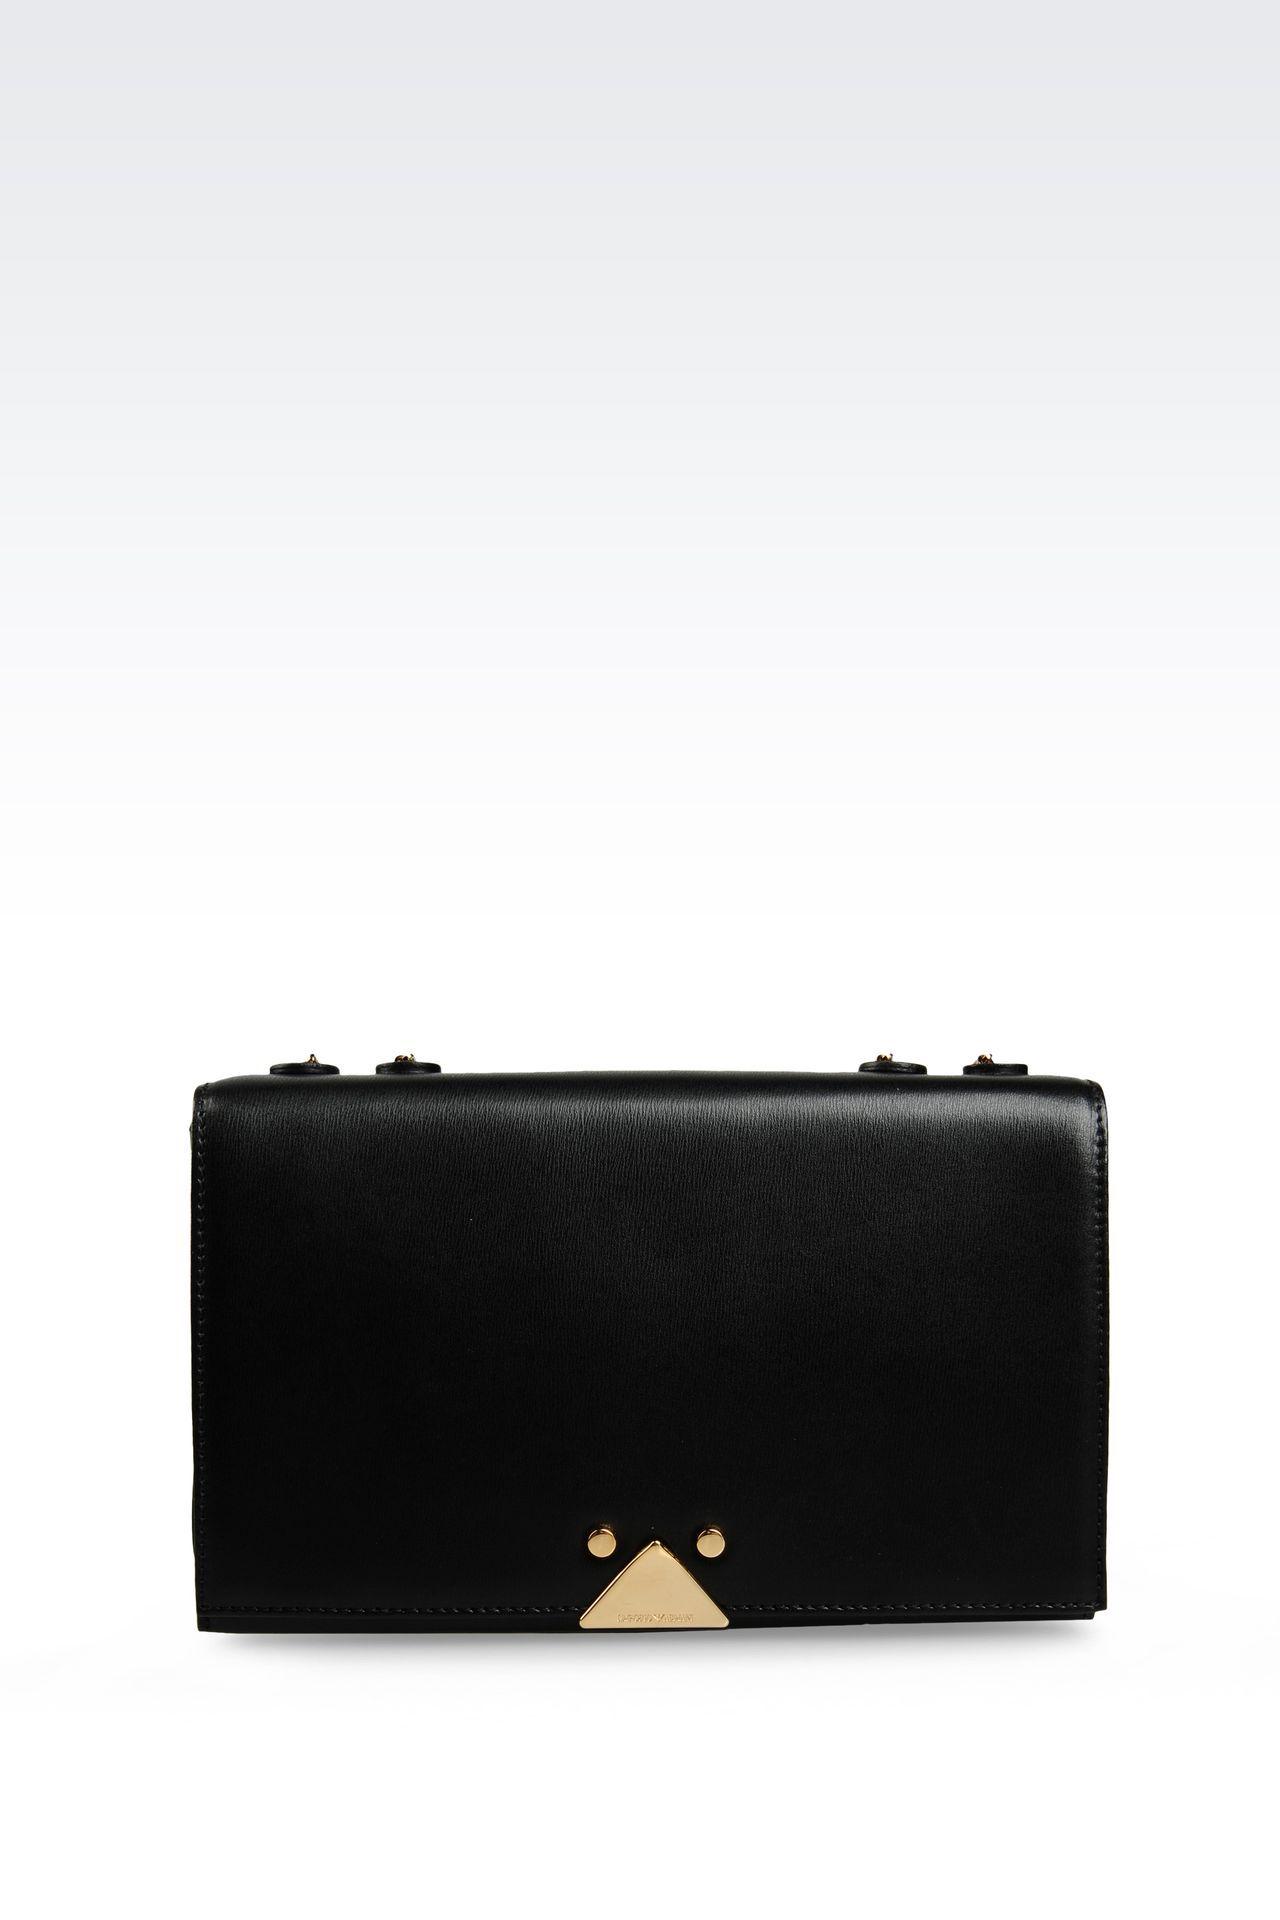 Emporio Armani Women Messenger Bag - Emporio Armani Official Online Store 893201b05d1c3